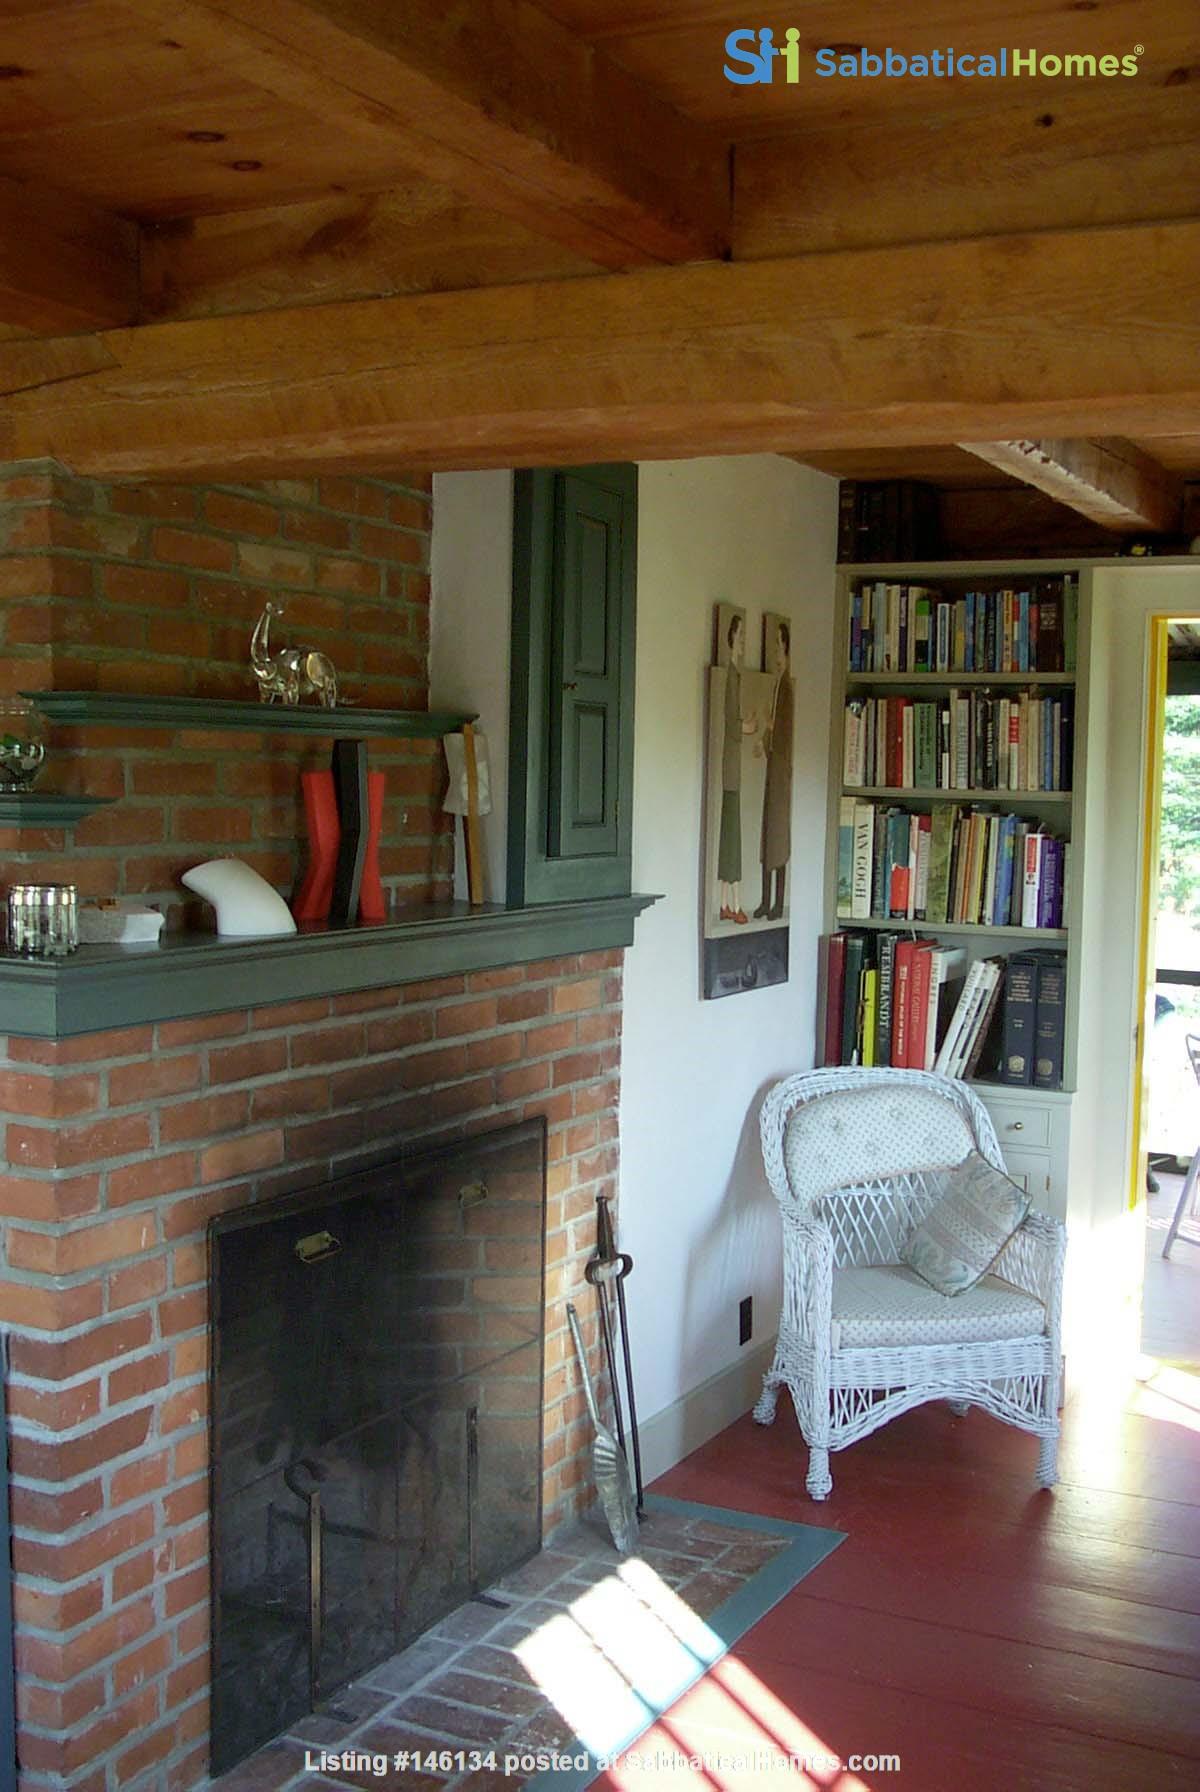 Idyllic Midcoast Maine Writer/Artist's Retreat Home Rental in Searsmont 0